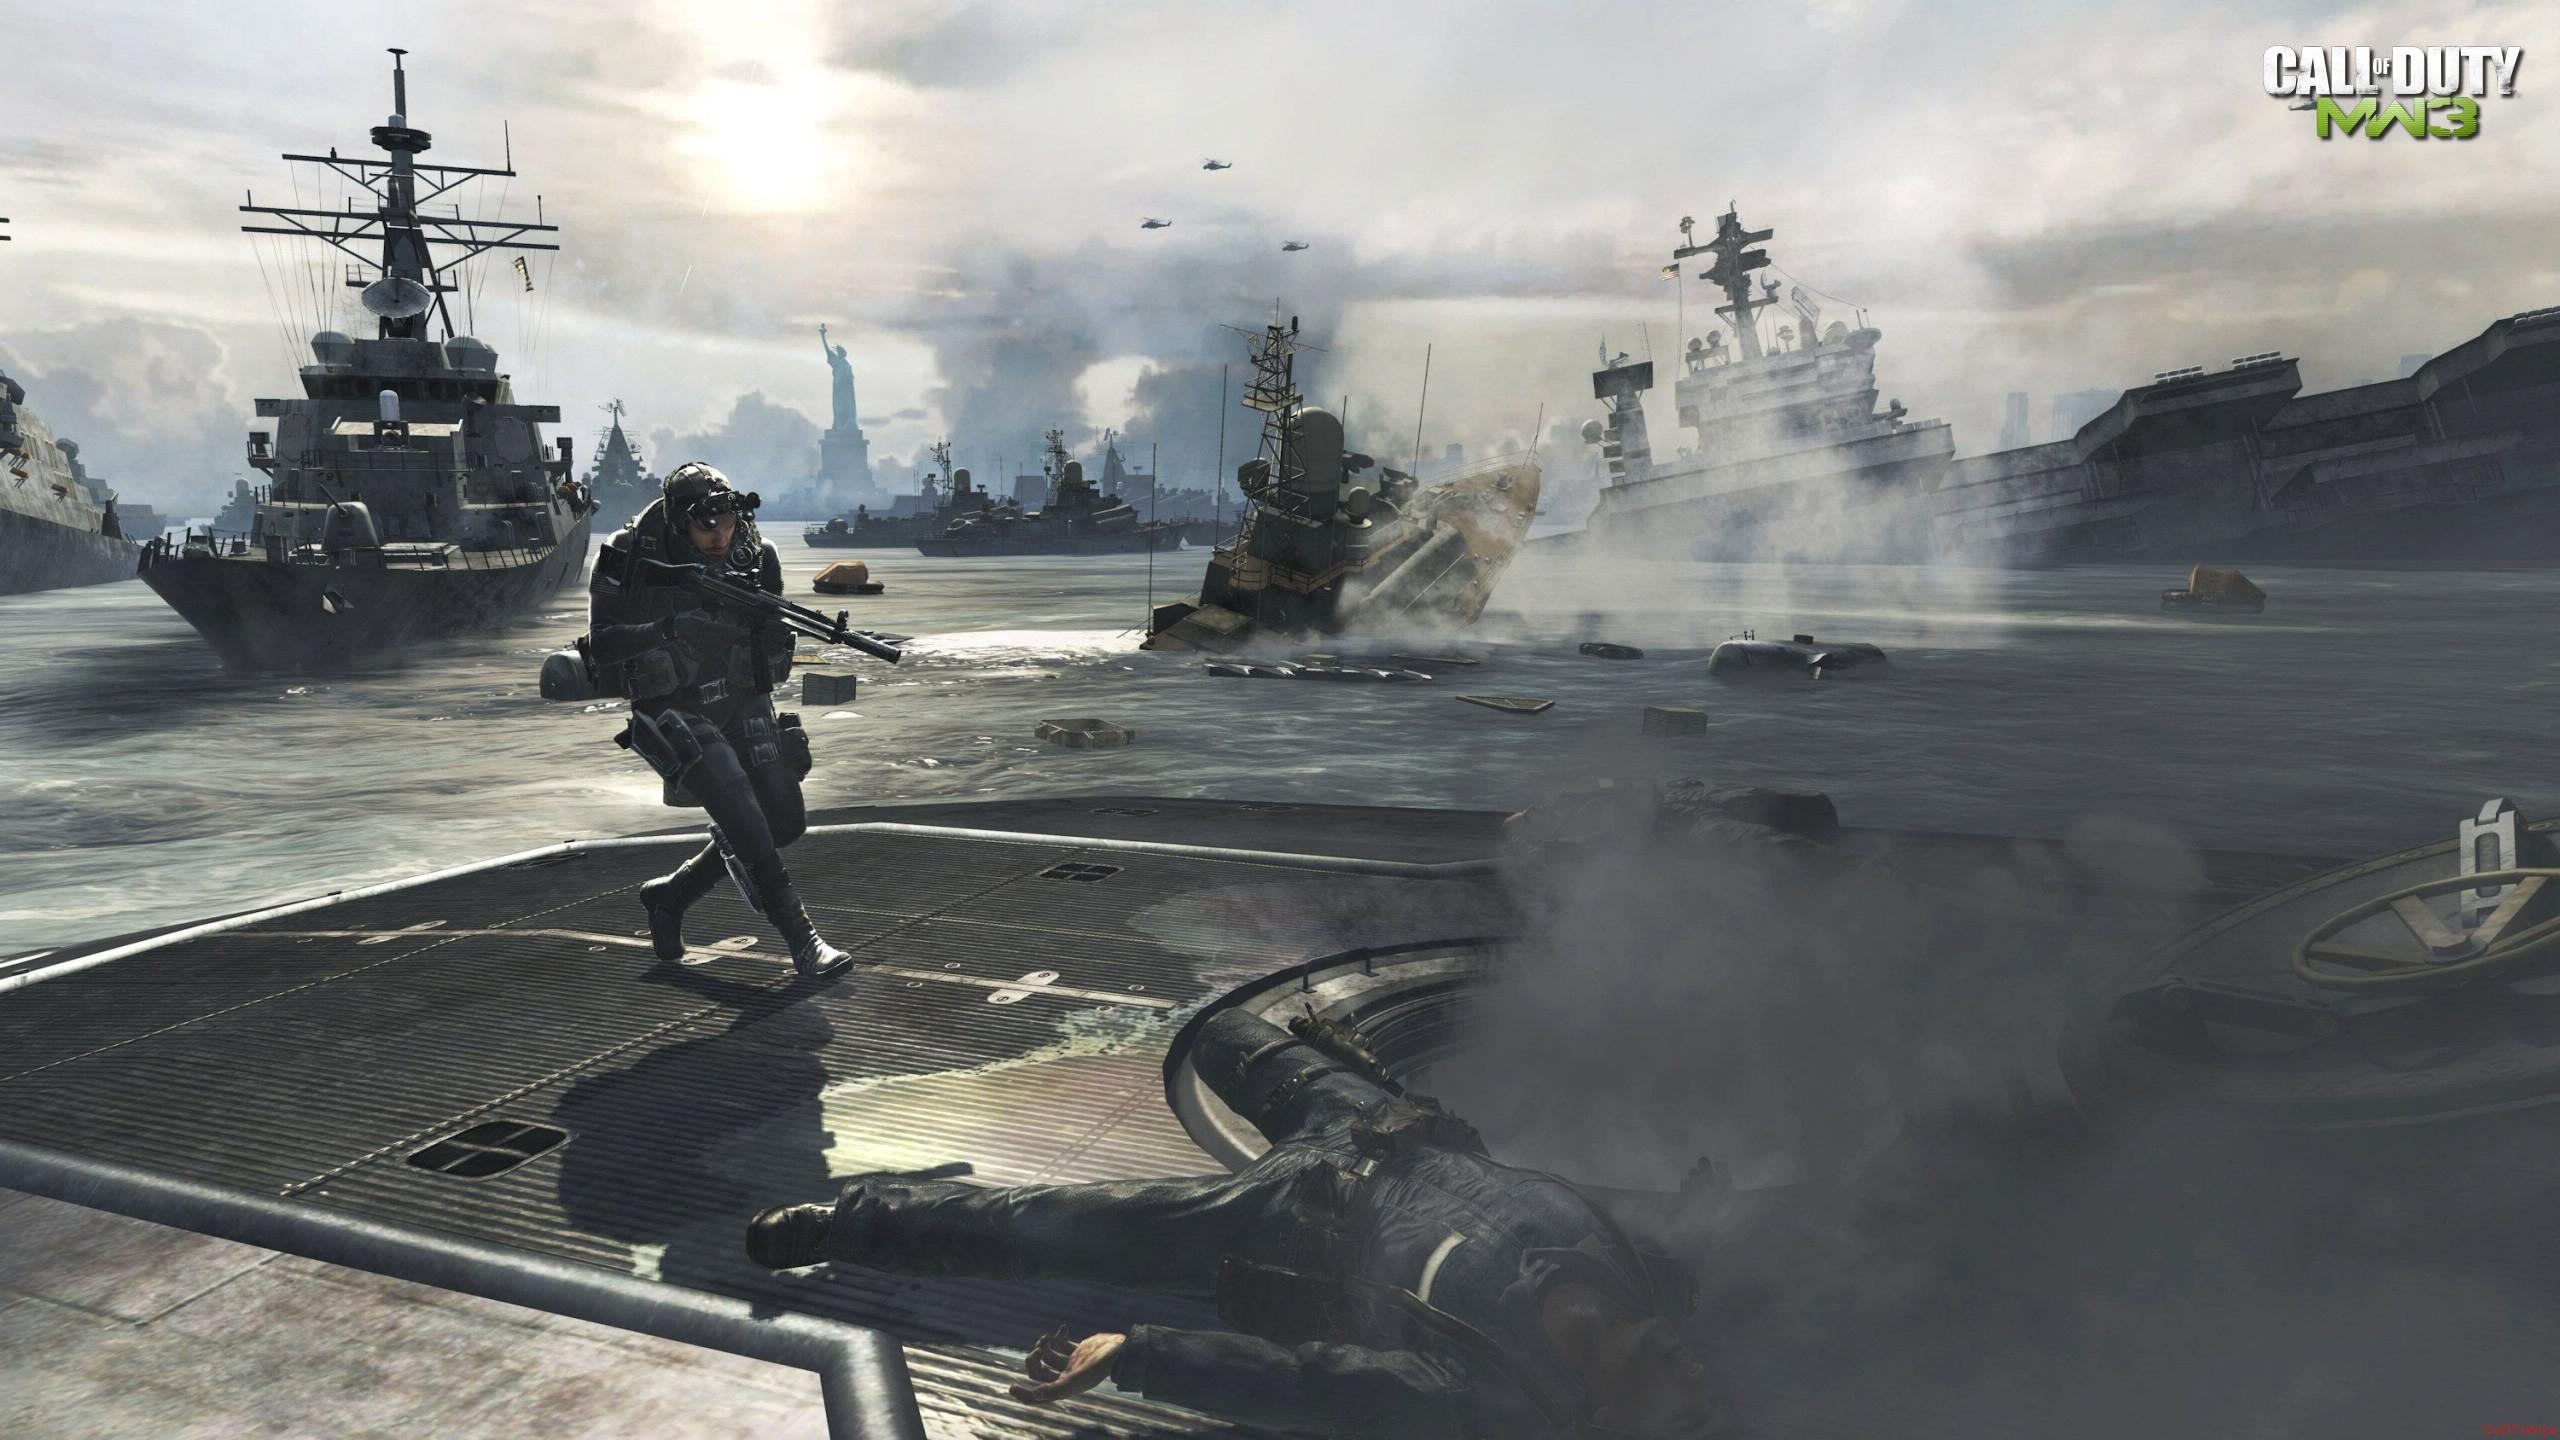 Call of Duty 8 Modern Warfare 3 Wallpaper Ekran Görüntüleri Screenshots